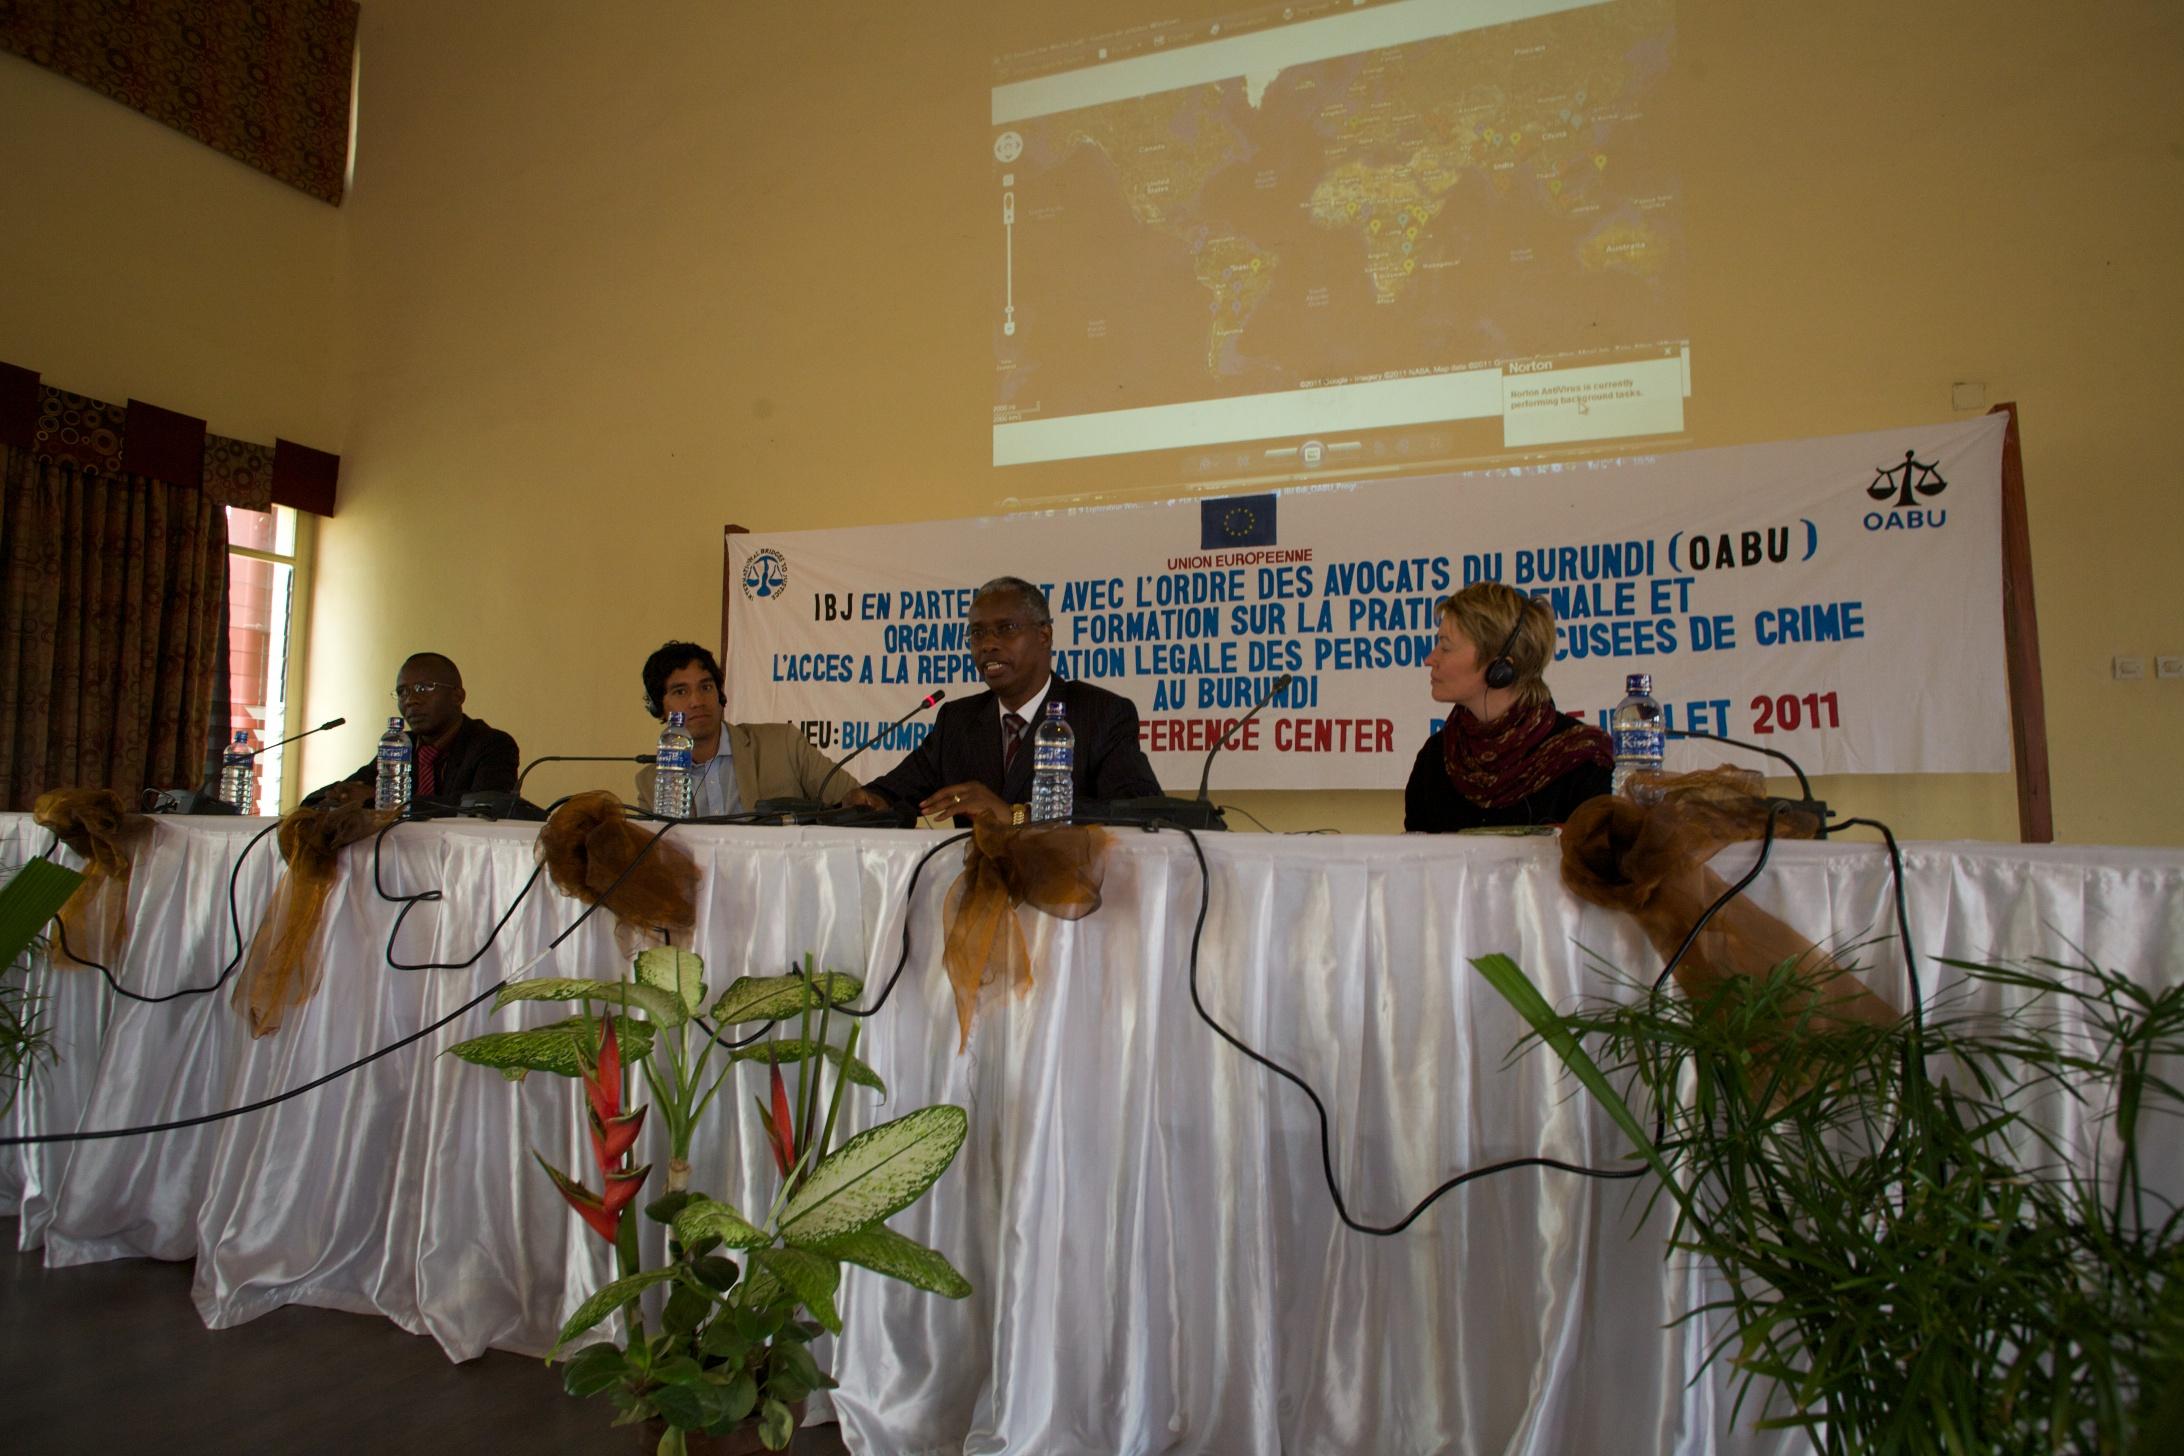 Opening speech by Batonnier de l ordre des avocats du Burundi of